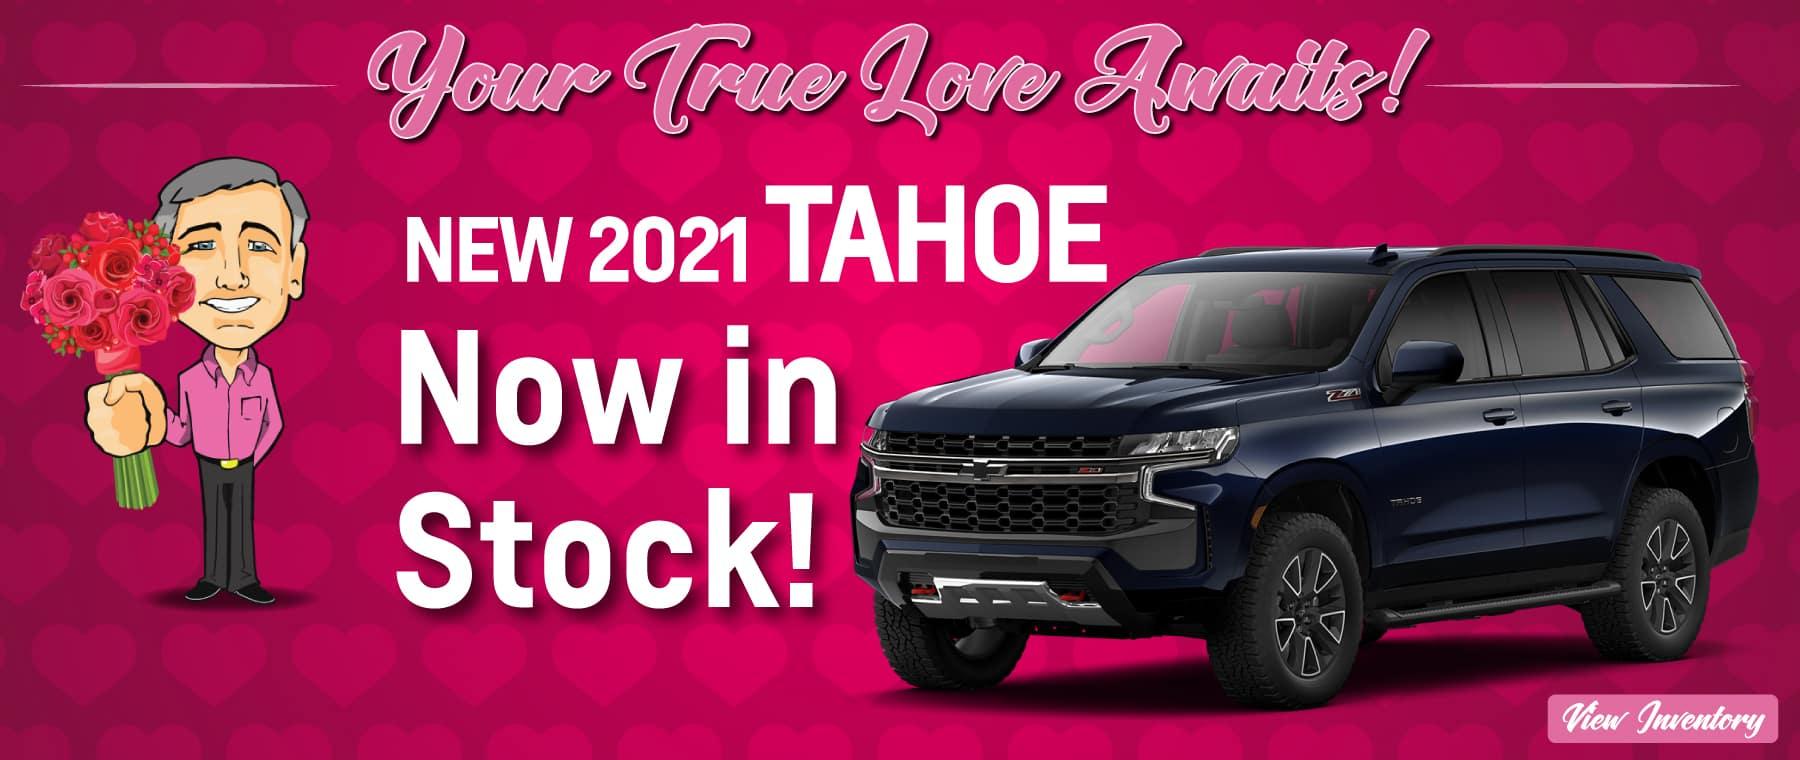 RACP69231-1-KB_2021_Tahoe_WEB_feb21